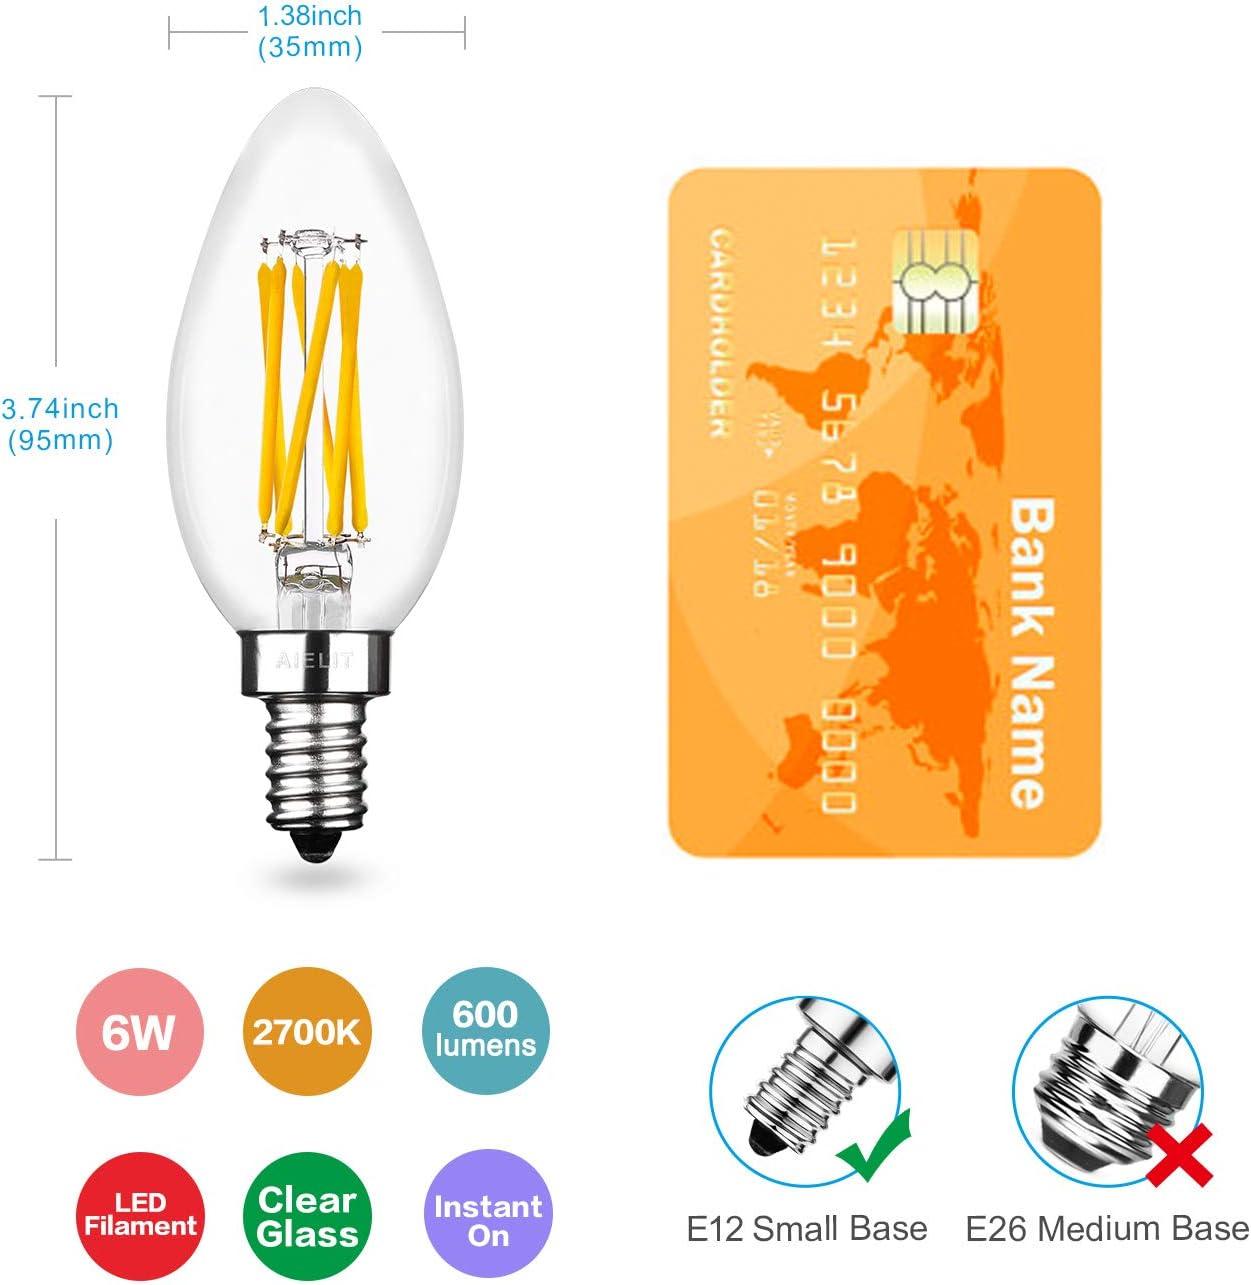 0-100/% 6W Vintage LED Candle Bulbs 60 Watts Equivalent Sputnik Chandelier Semi-Flush Mount Dimmable 4 Pack Warm White 2700K AIELIT B11 E12 LED Light Bulb for Kitchen Island Linear Pendant